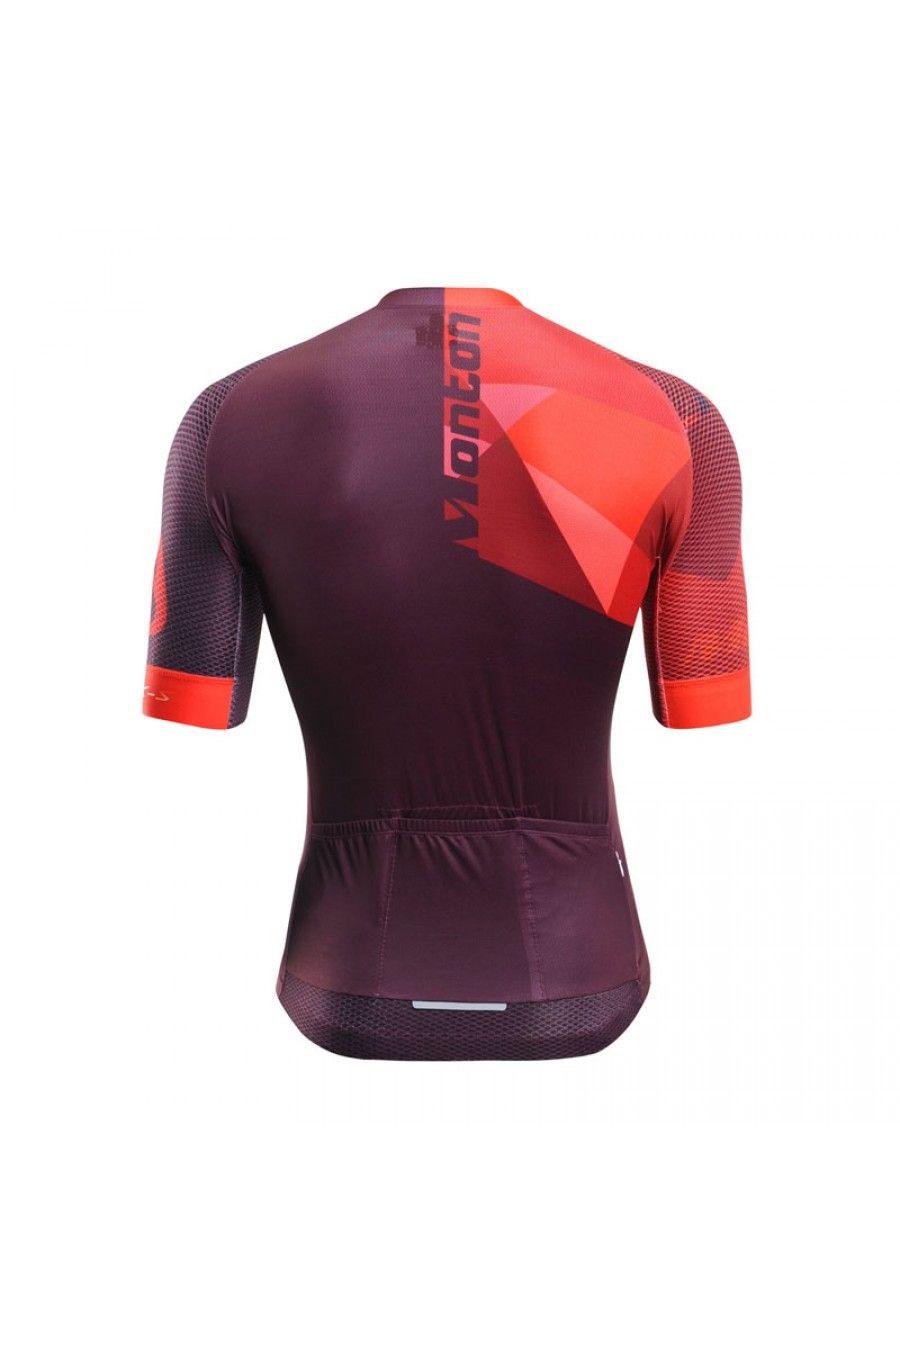 Bike Jerseys Custom Cycling Outfit Bike Wear Cycling Wear